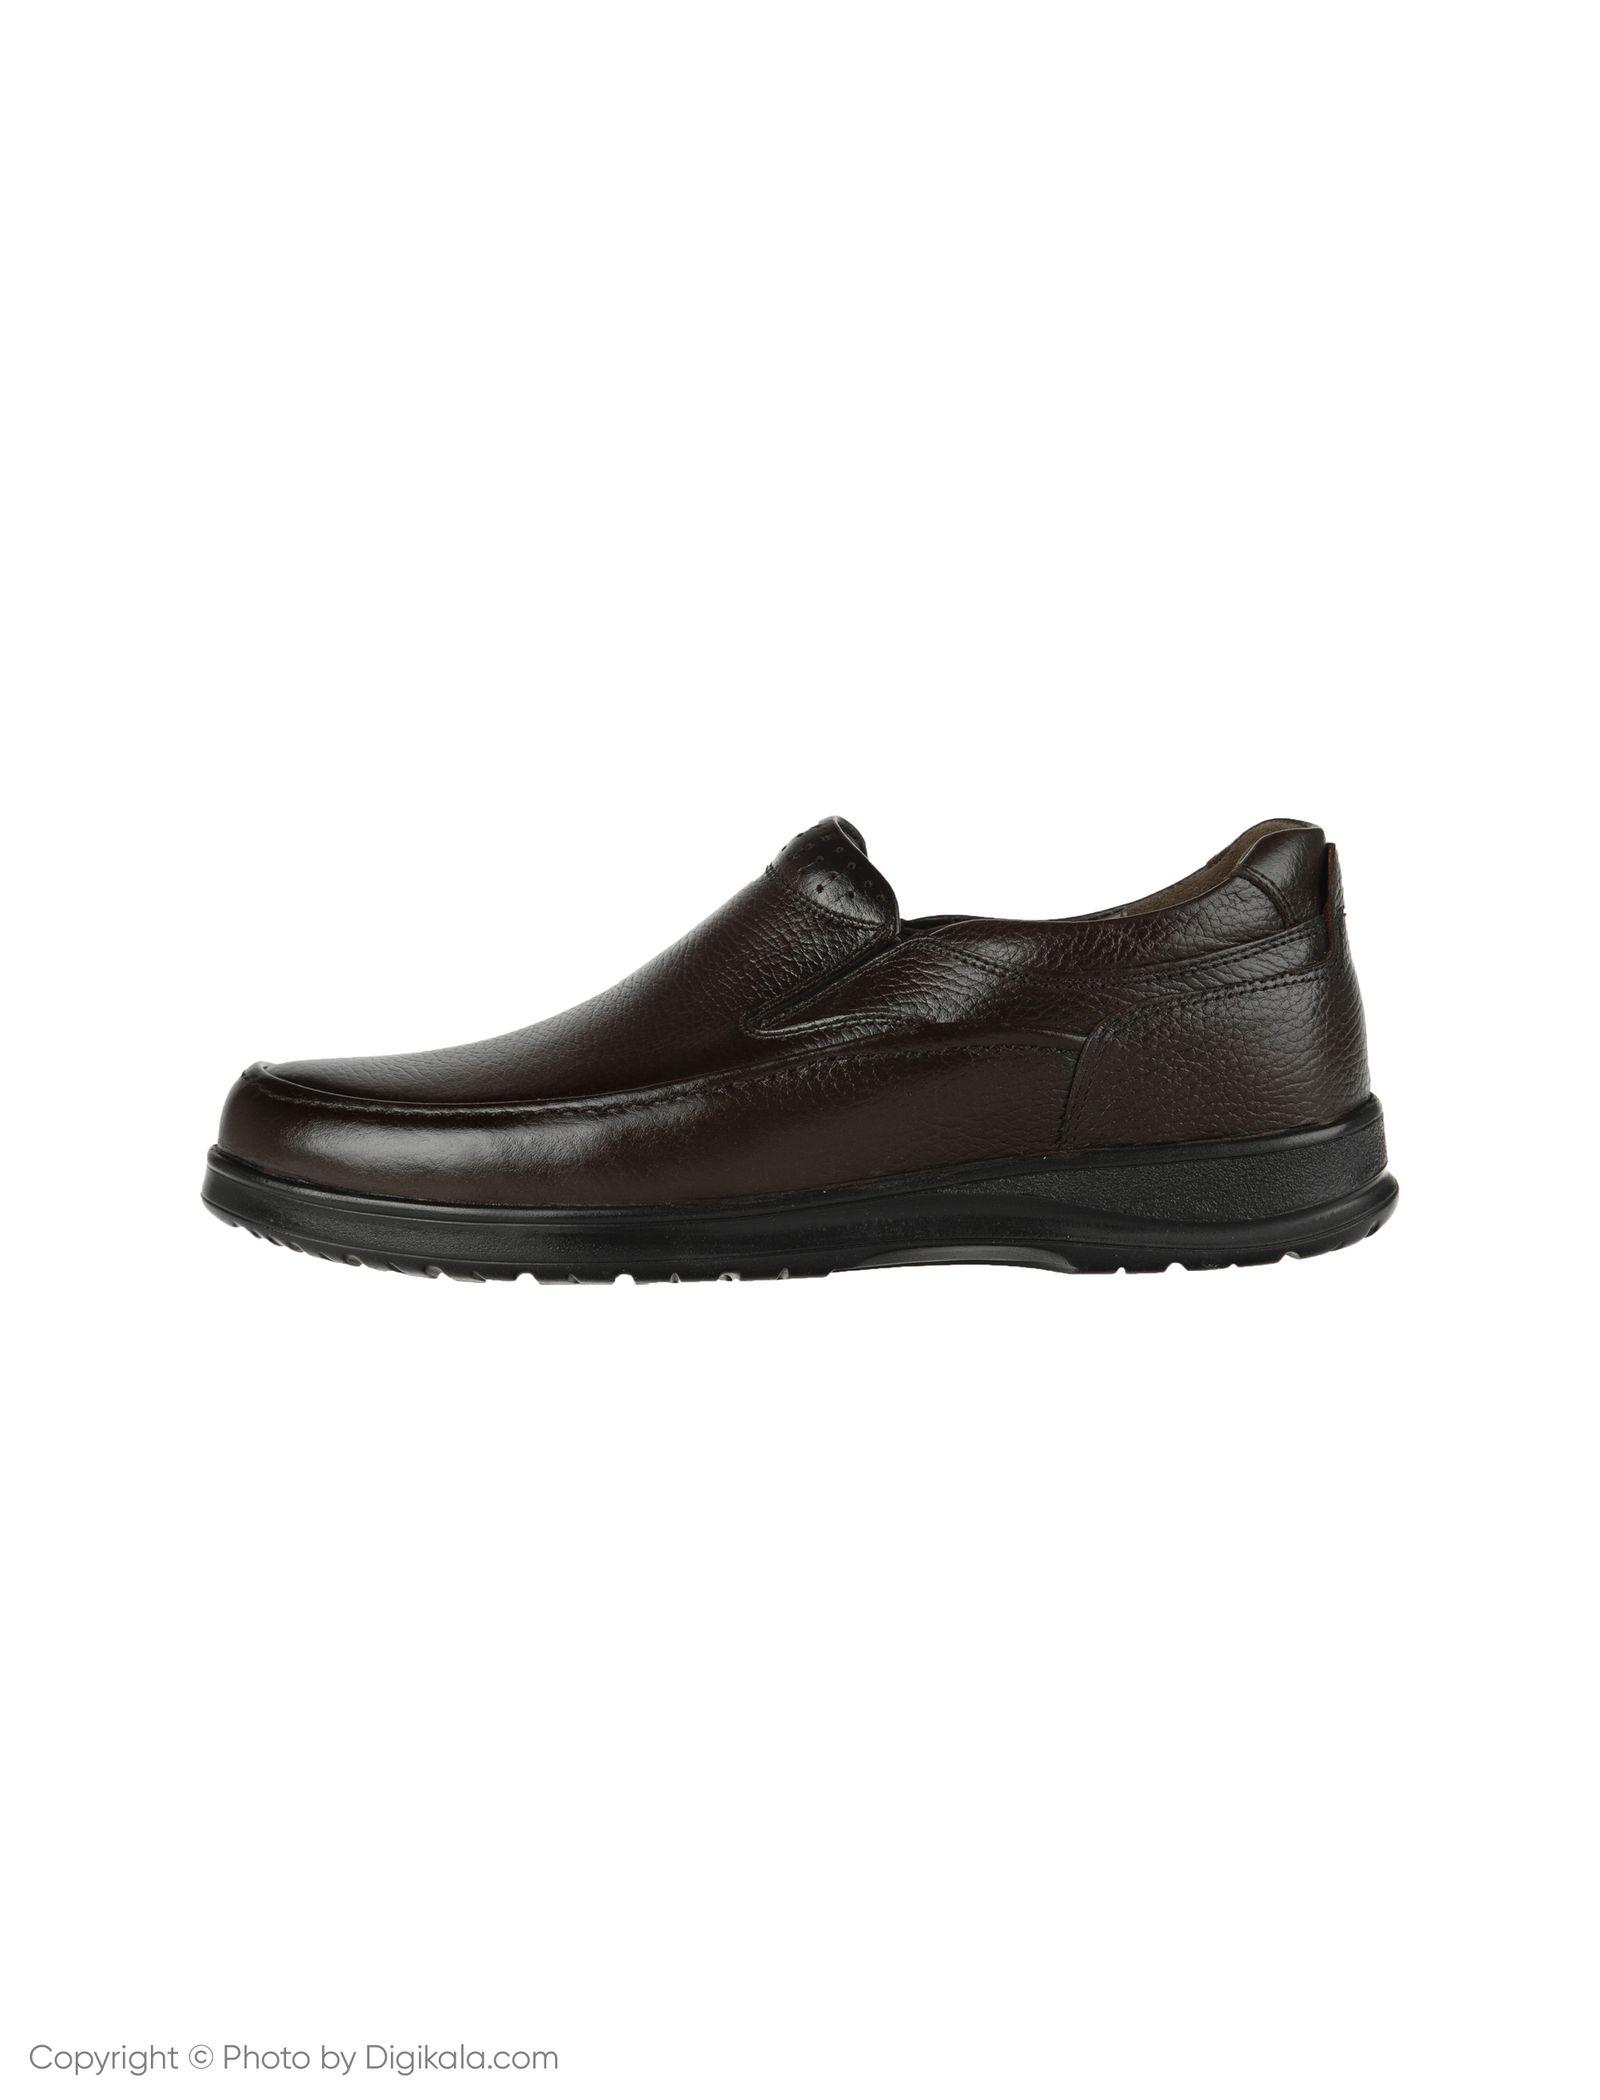 کفش روزمره مردانه ساتین مدل SN7172A-104 -  - 1